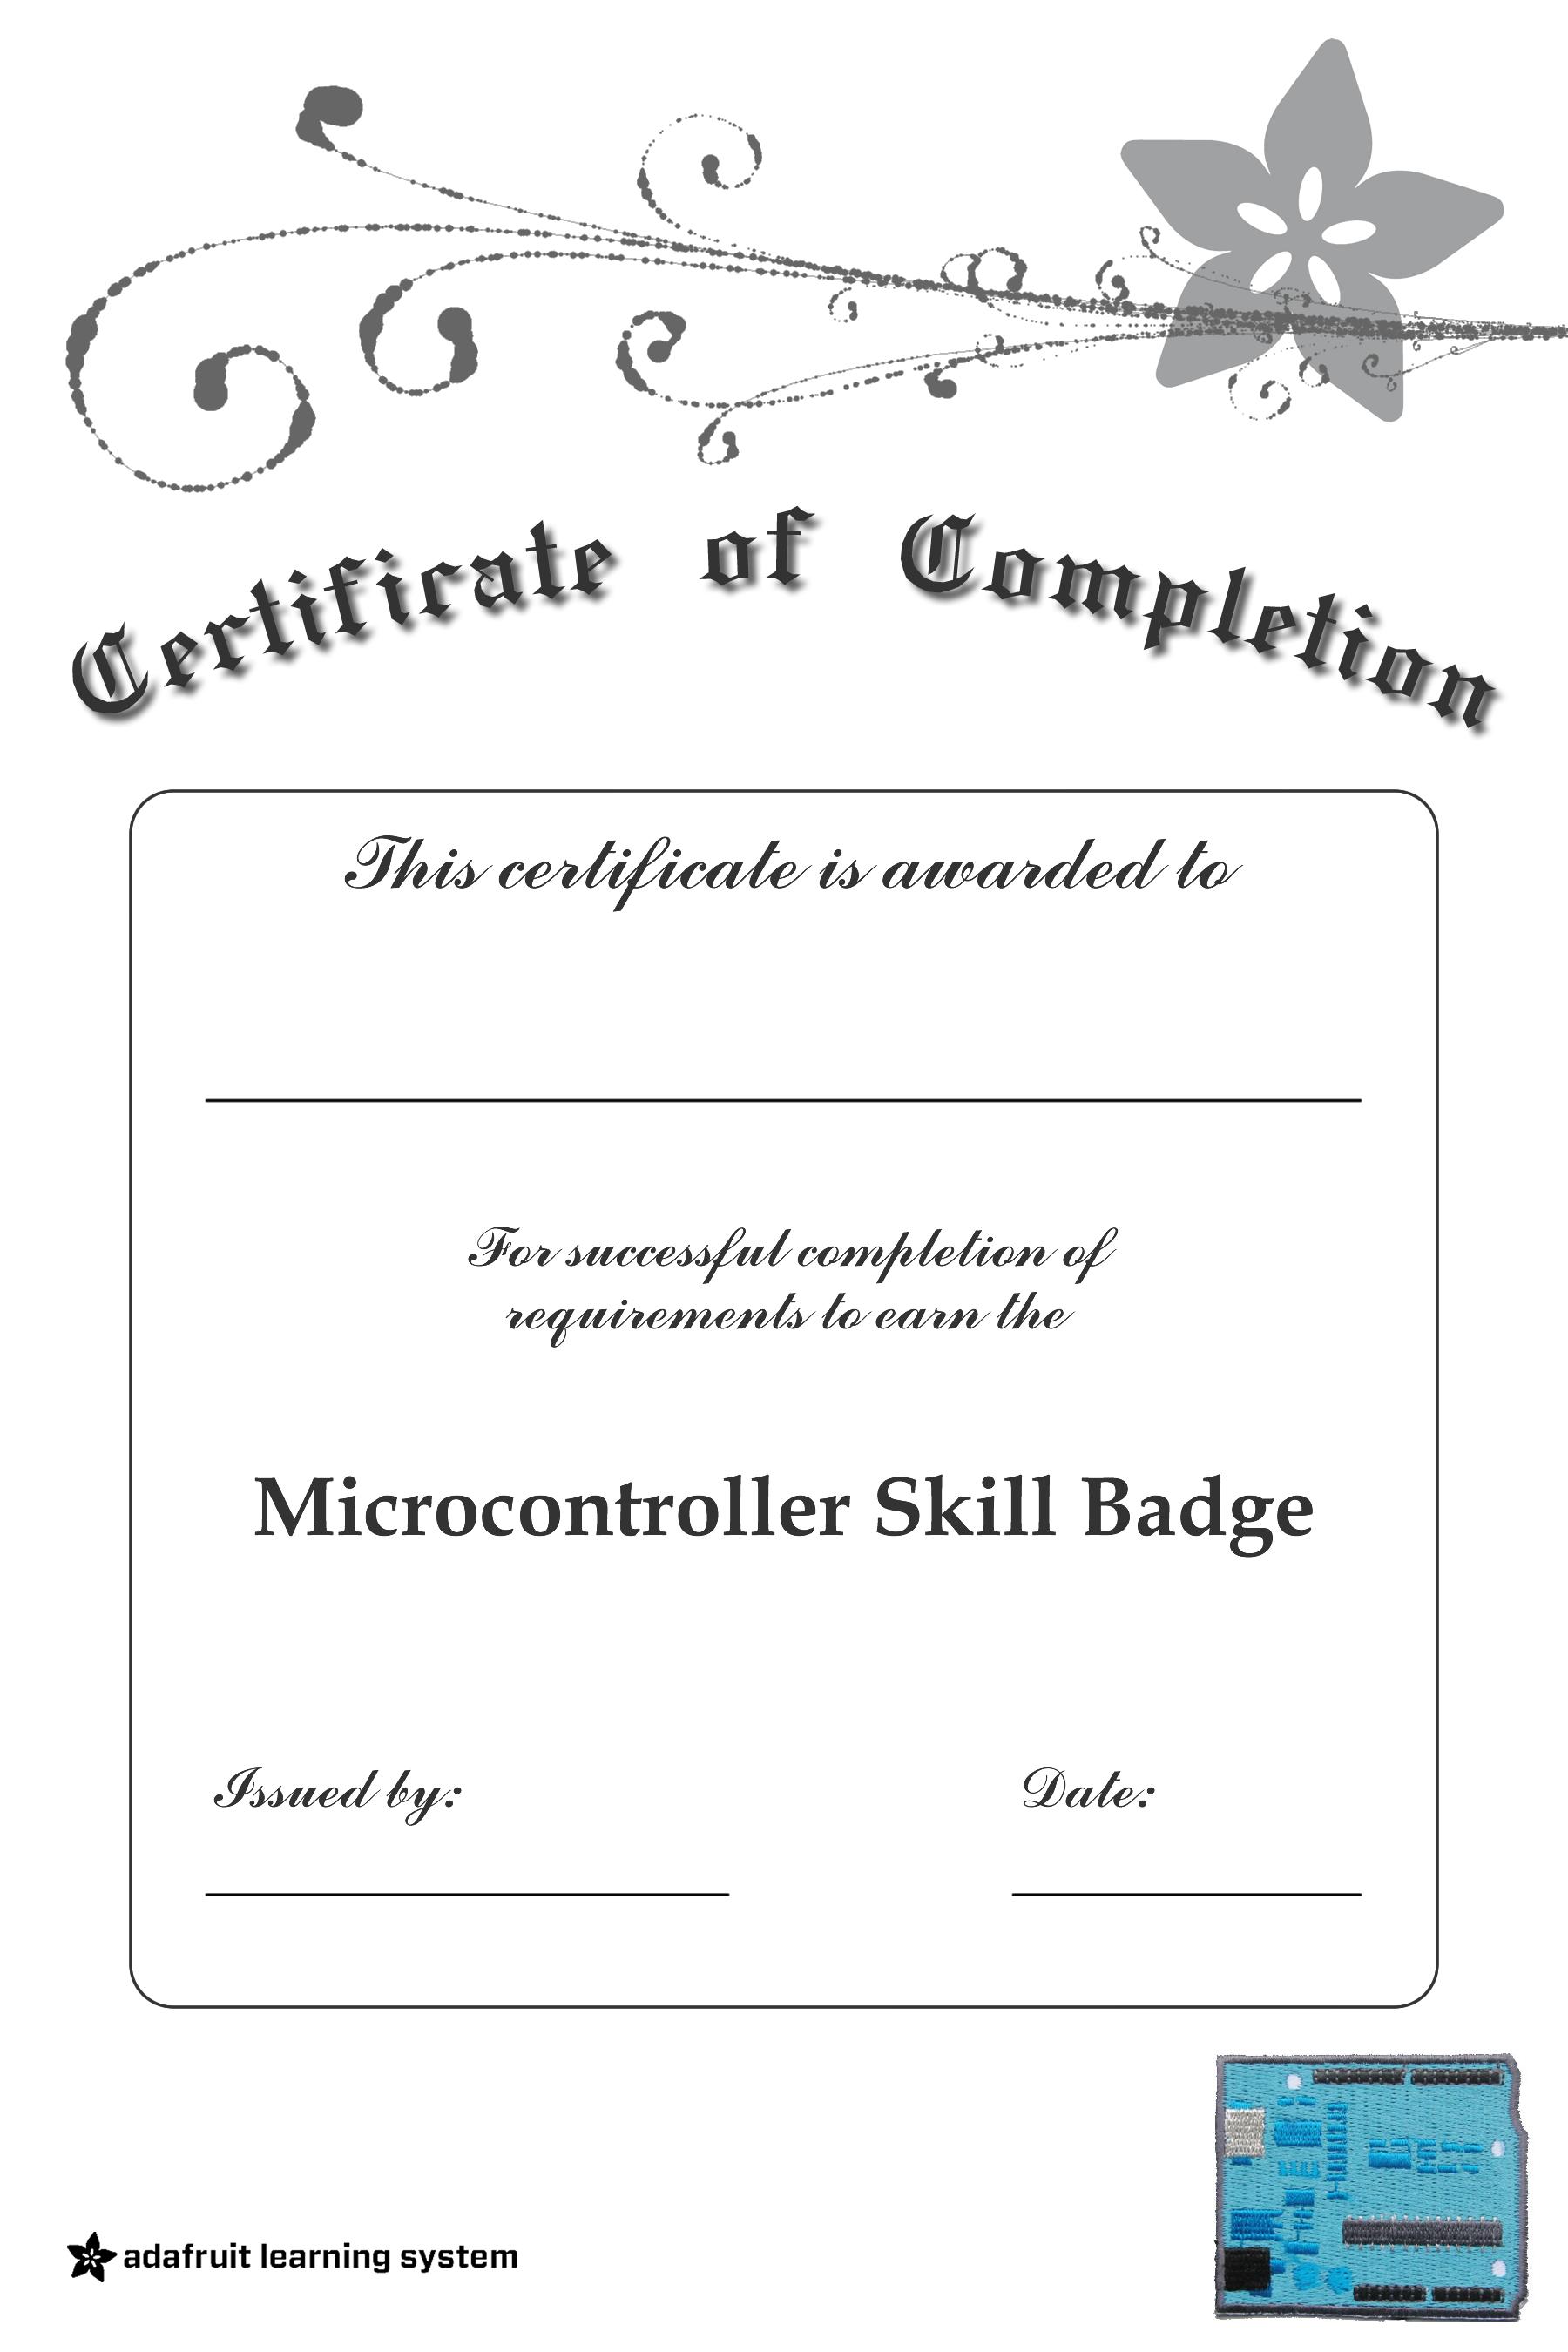 braincrafts_microcontroller_-_certificate.png